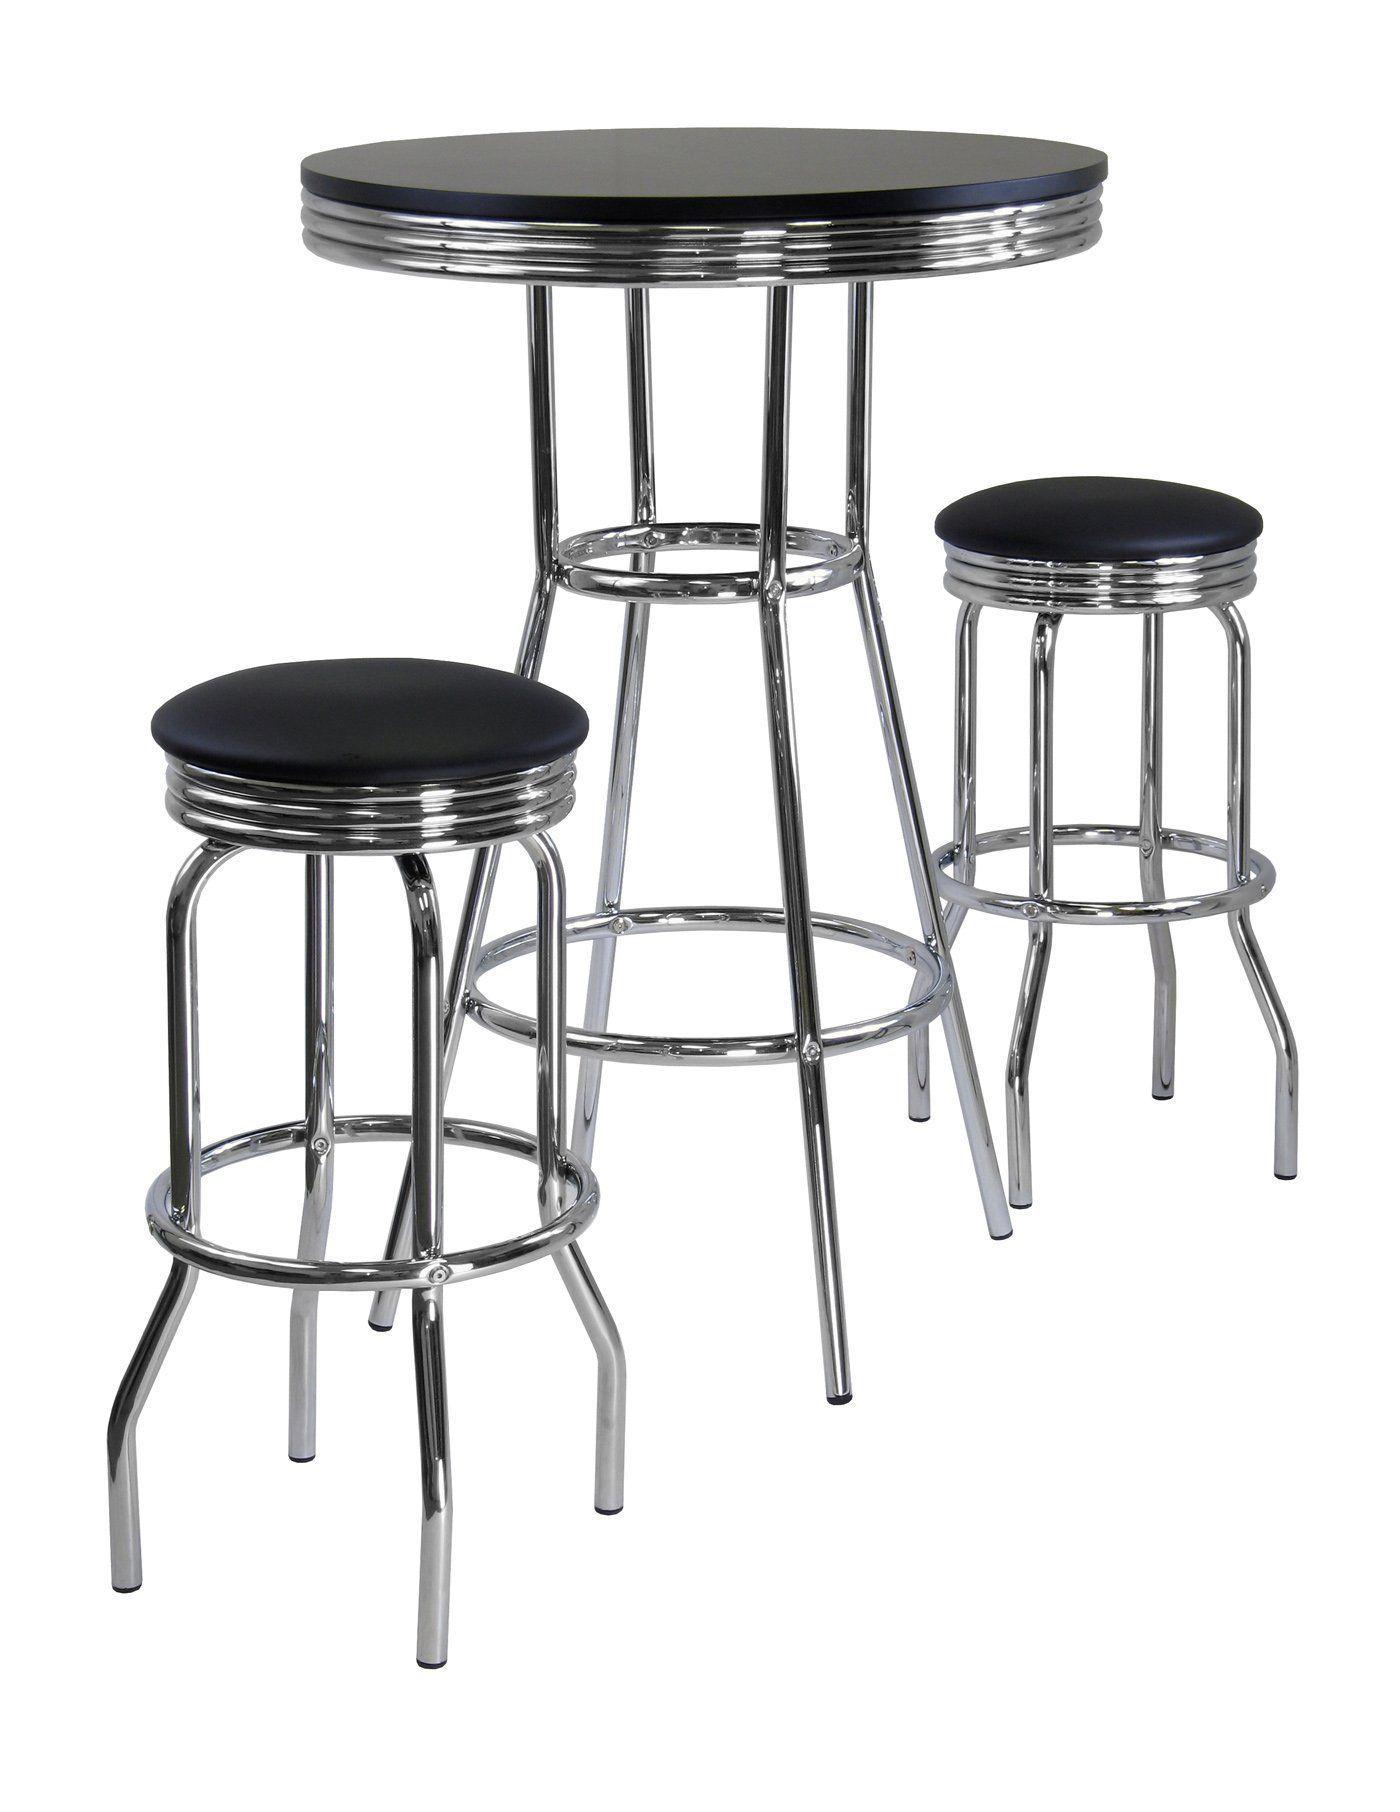 Summit 3 Pc Round Table With Two Swivel Barstools Pub Set Black Chrome